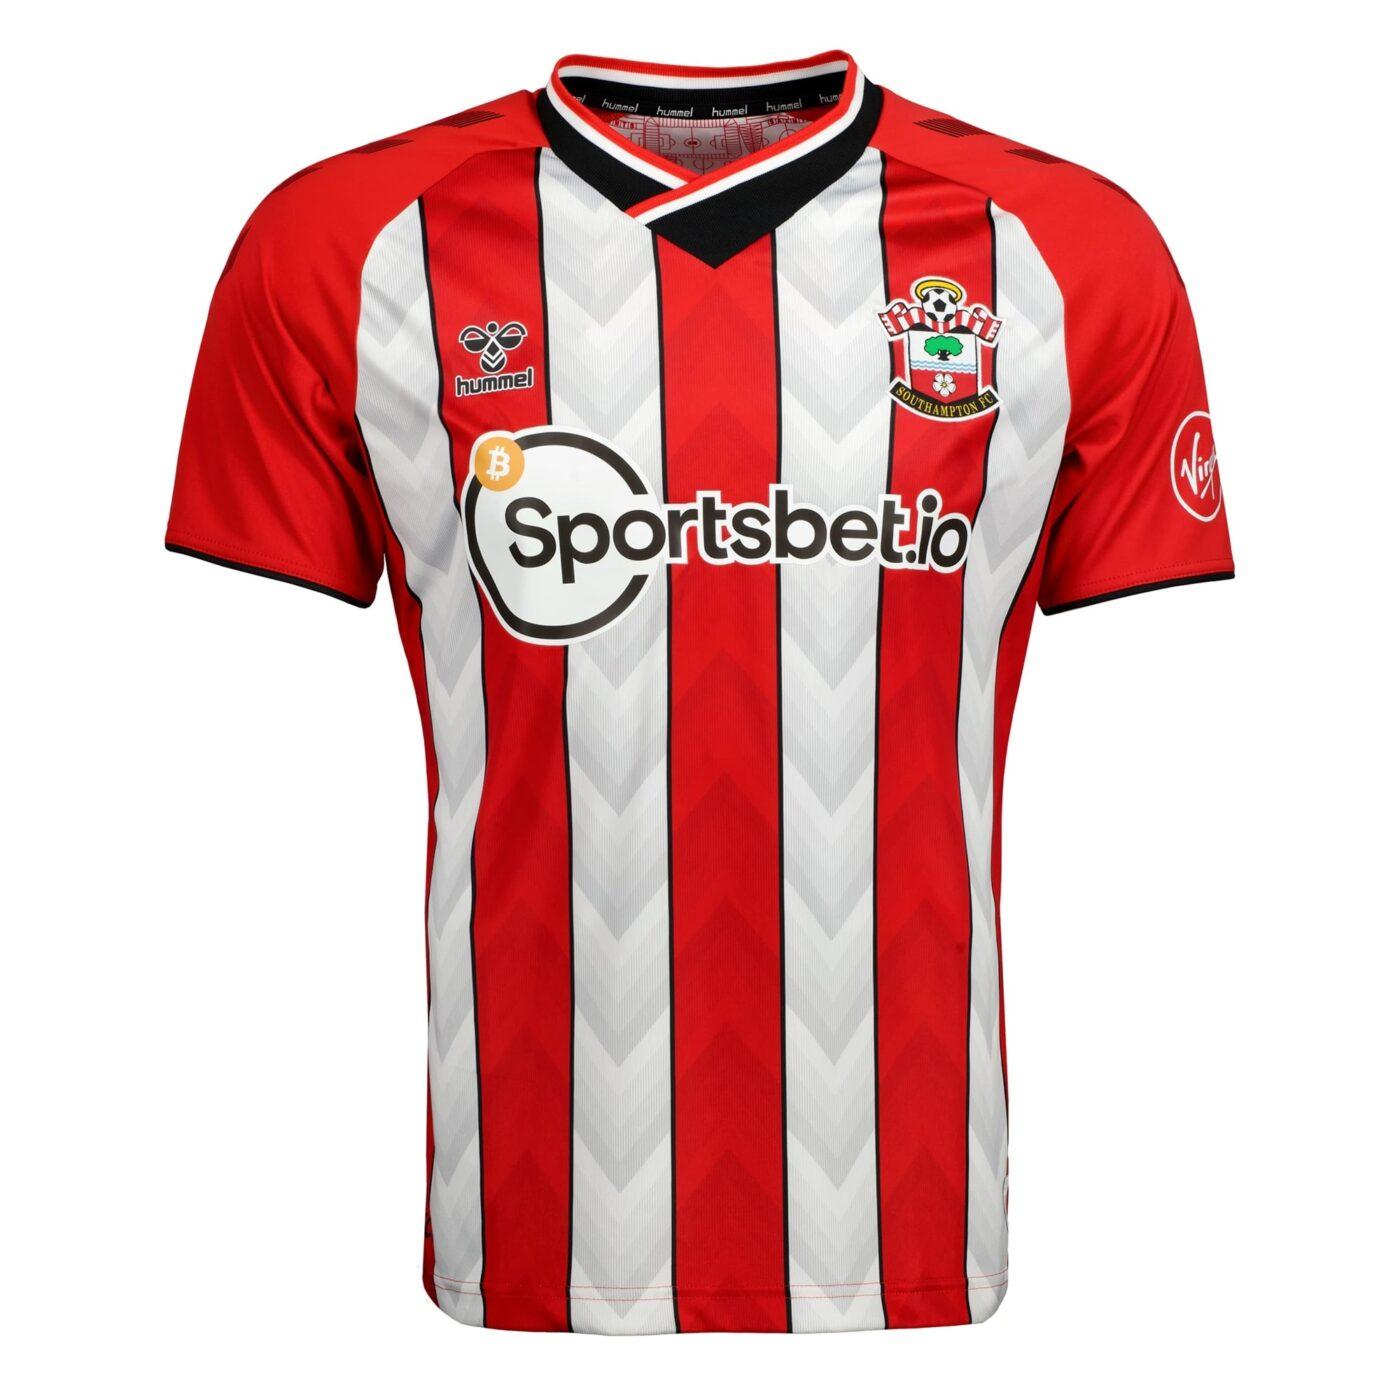 Maillot Southampton 2021-2022 domicile hummel